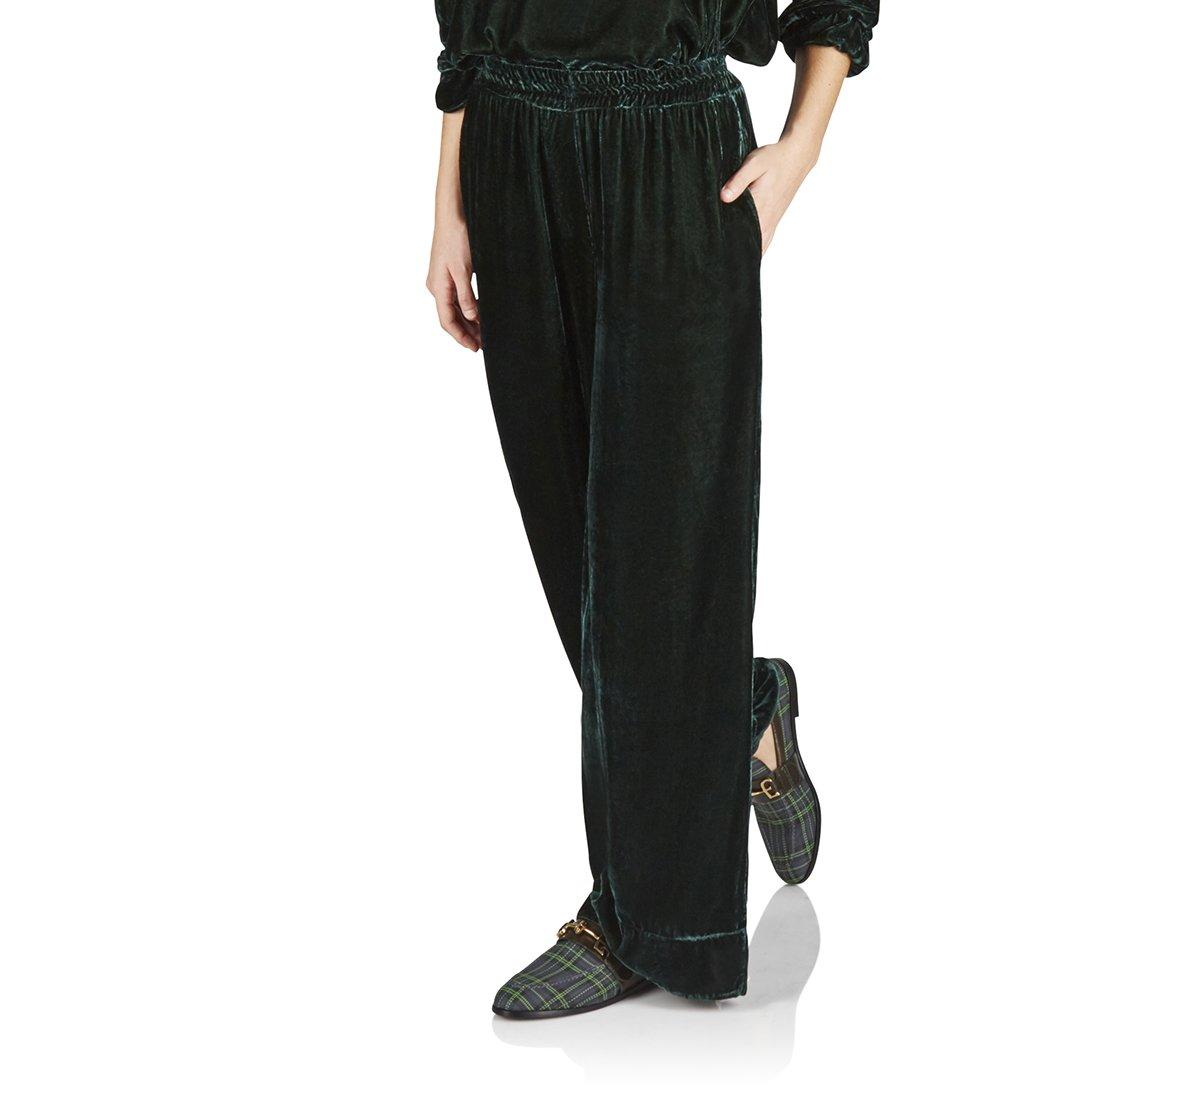 Pantalone largo in morbida viscosa